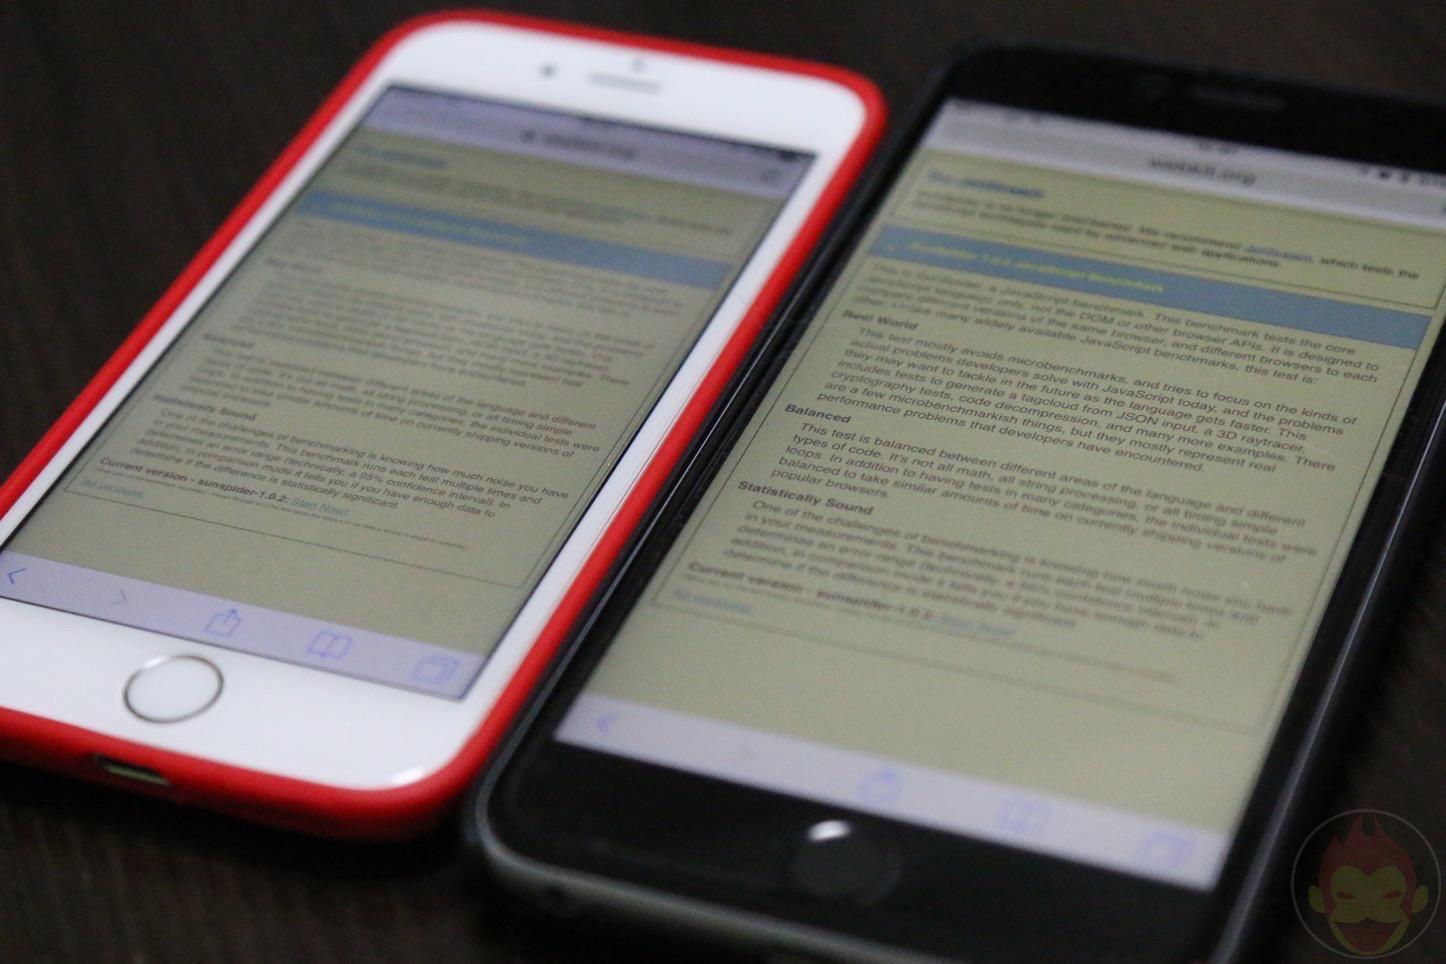 iPhone6s-6splus-comparison-benchmark-tests-23.JPG